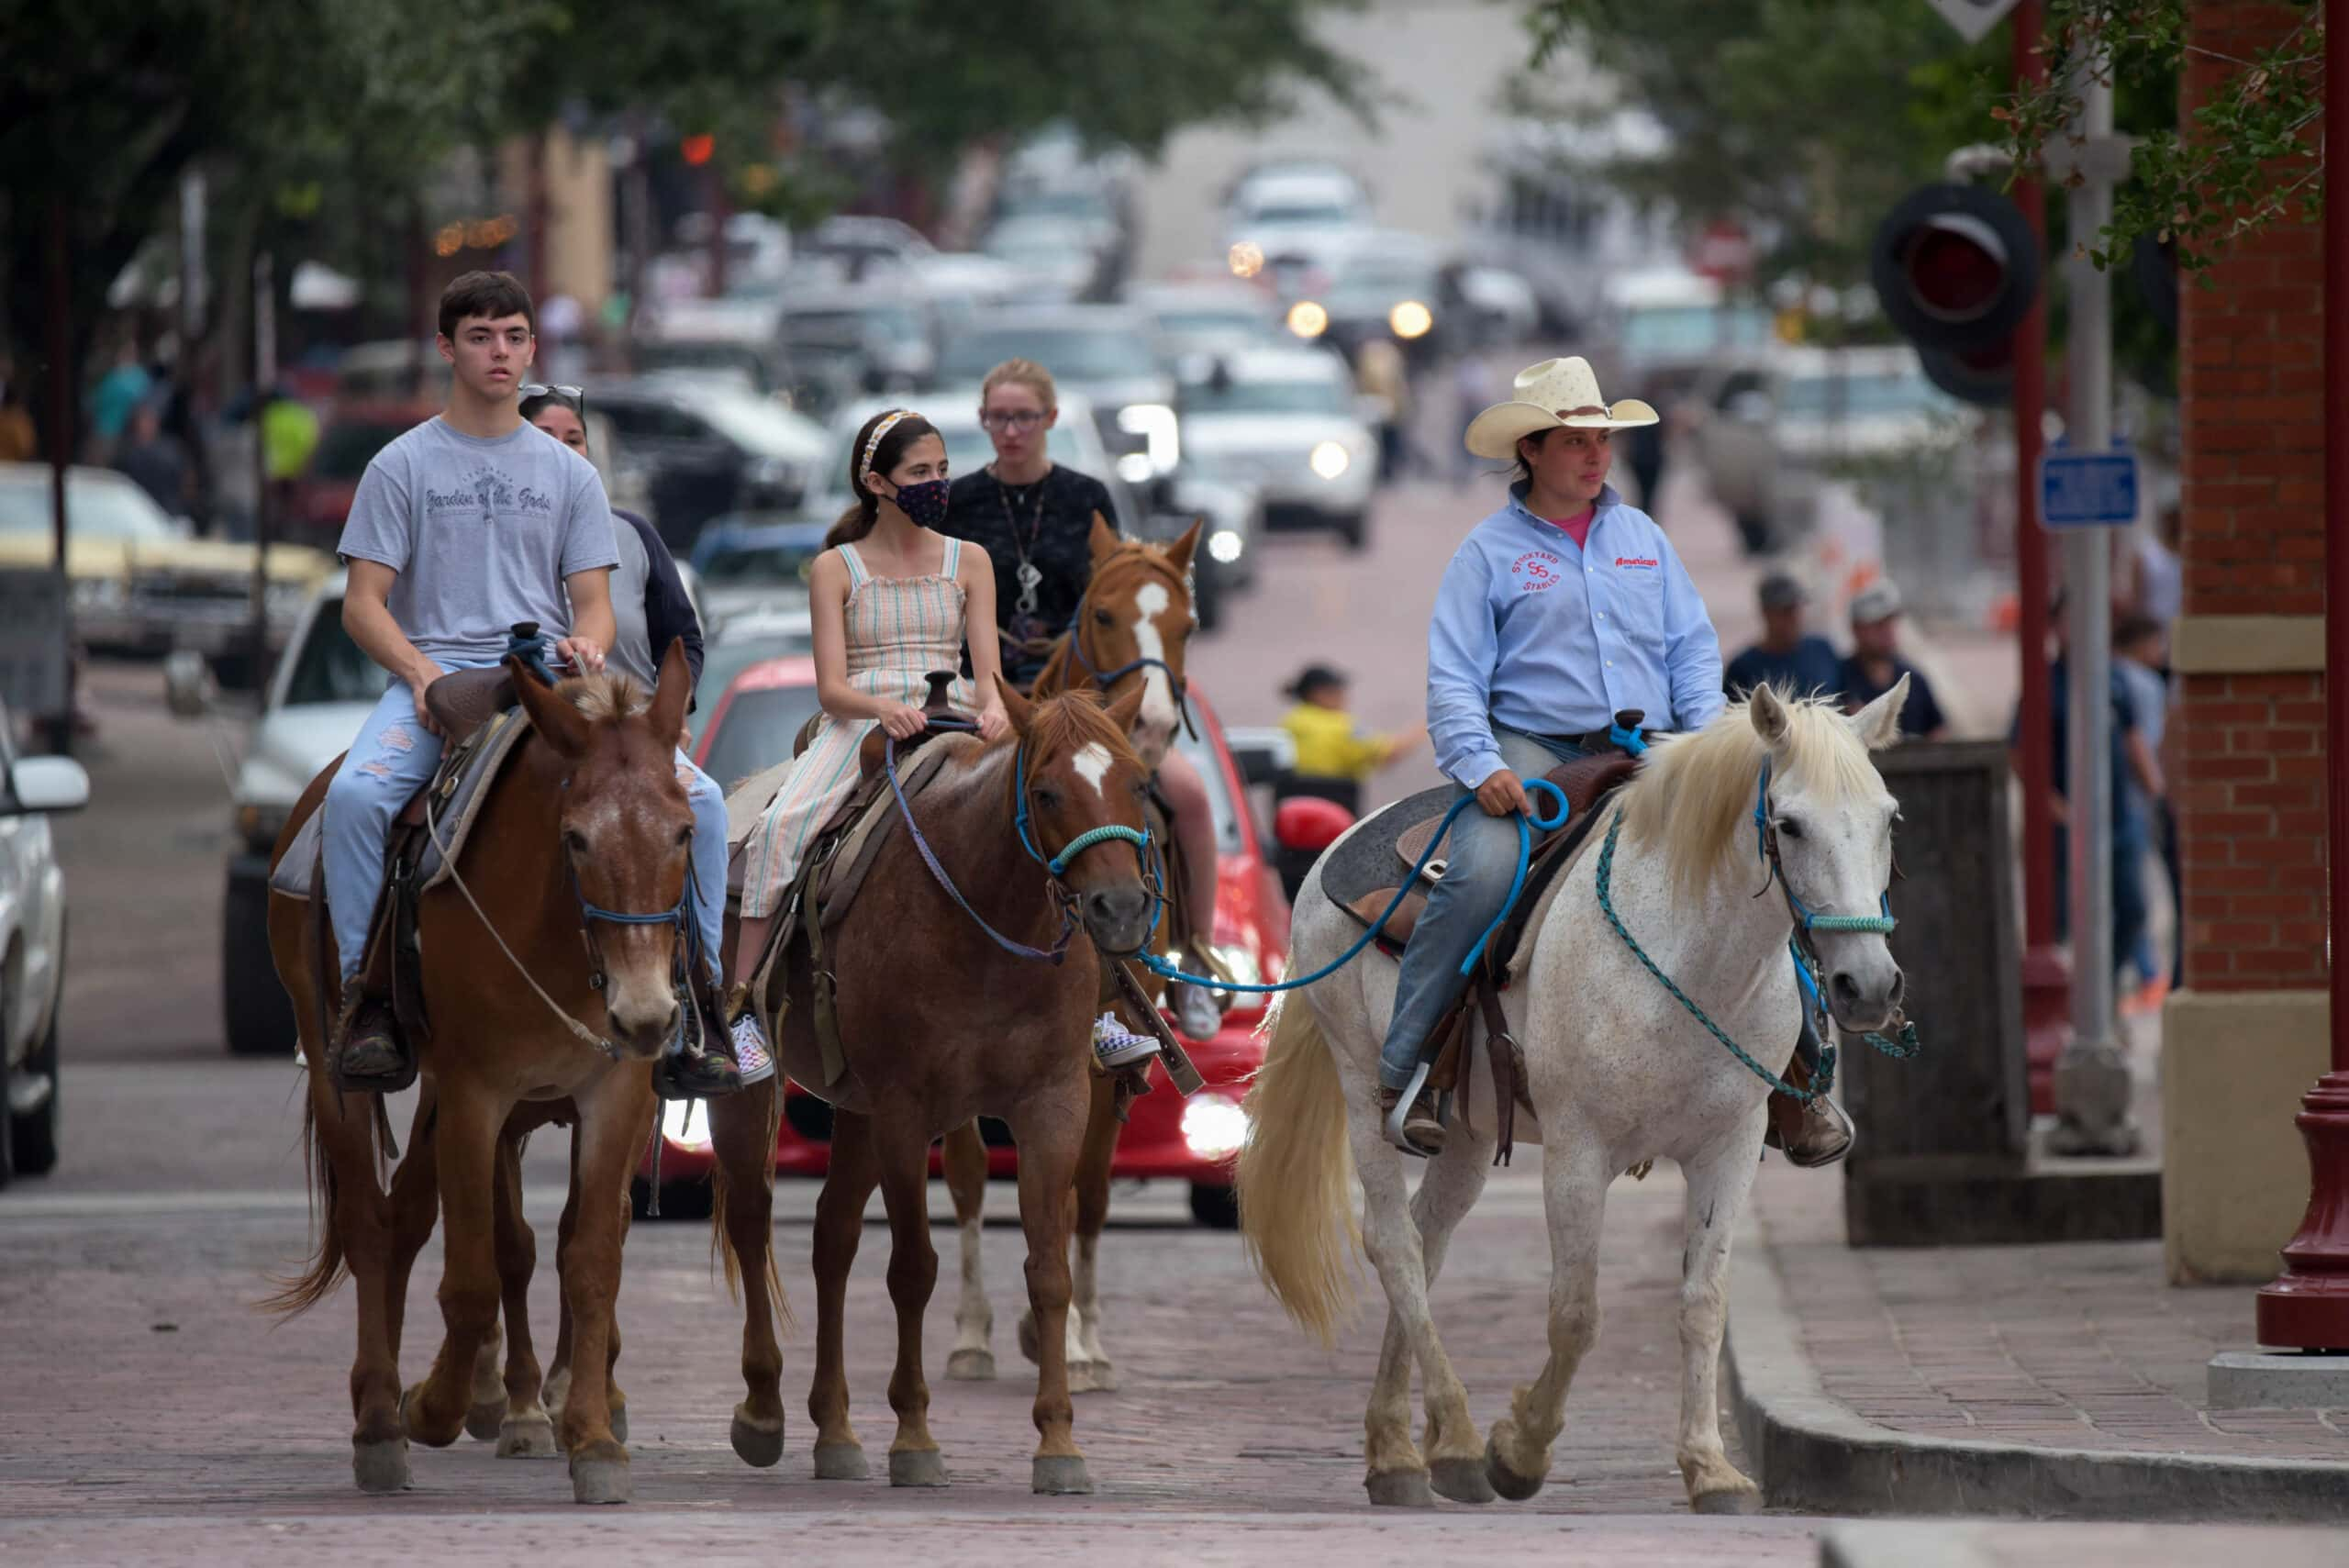 people on horseback in Ft. Worth